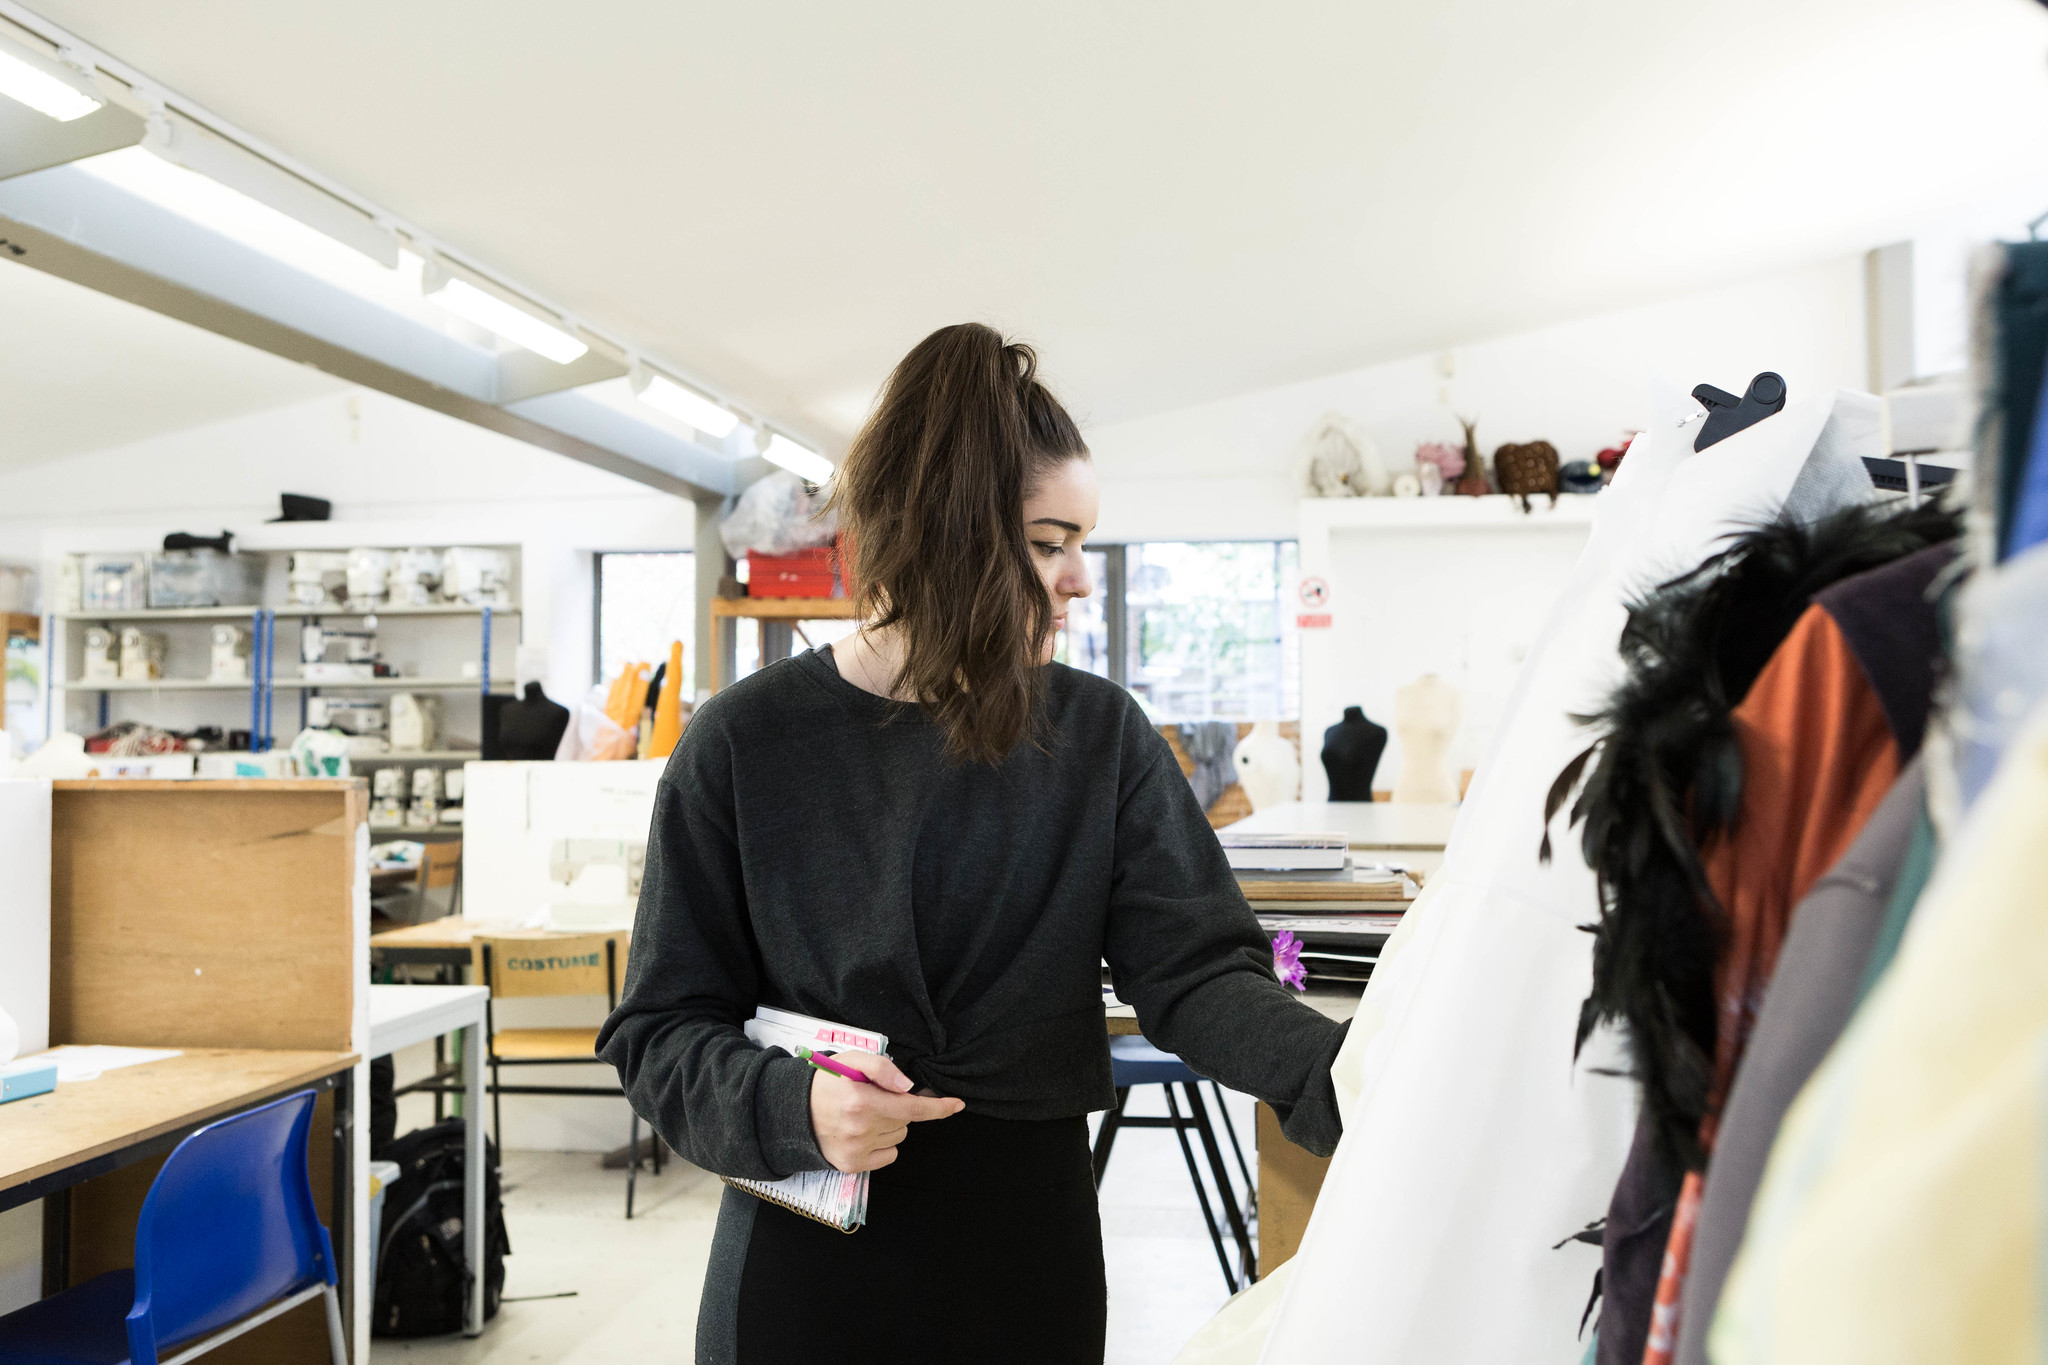 Girl arranges garments